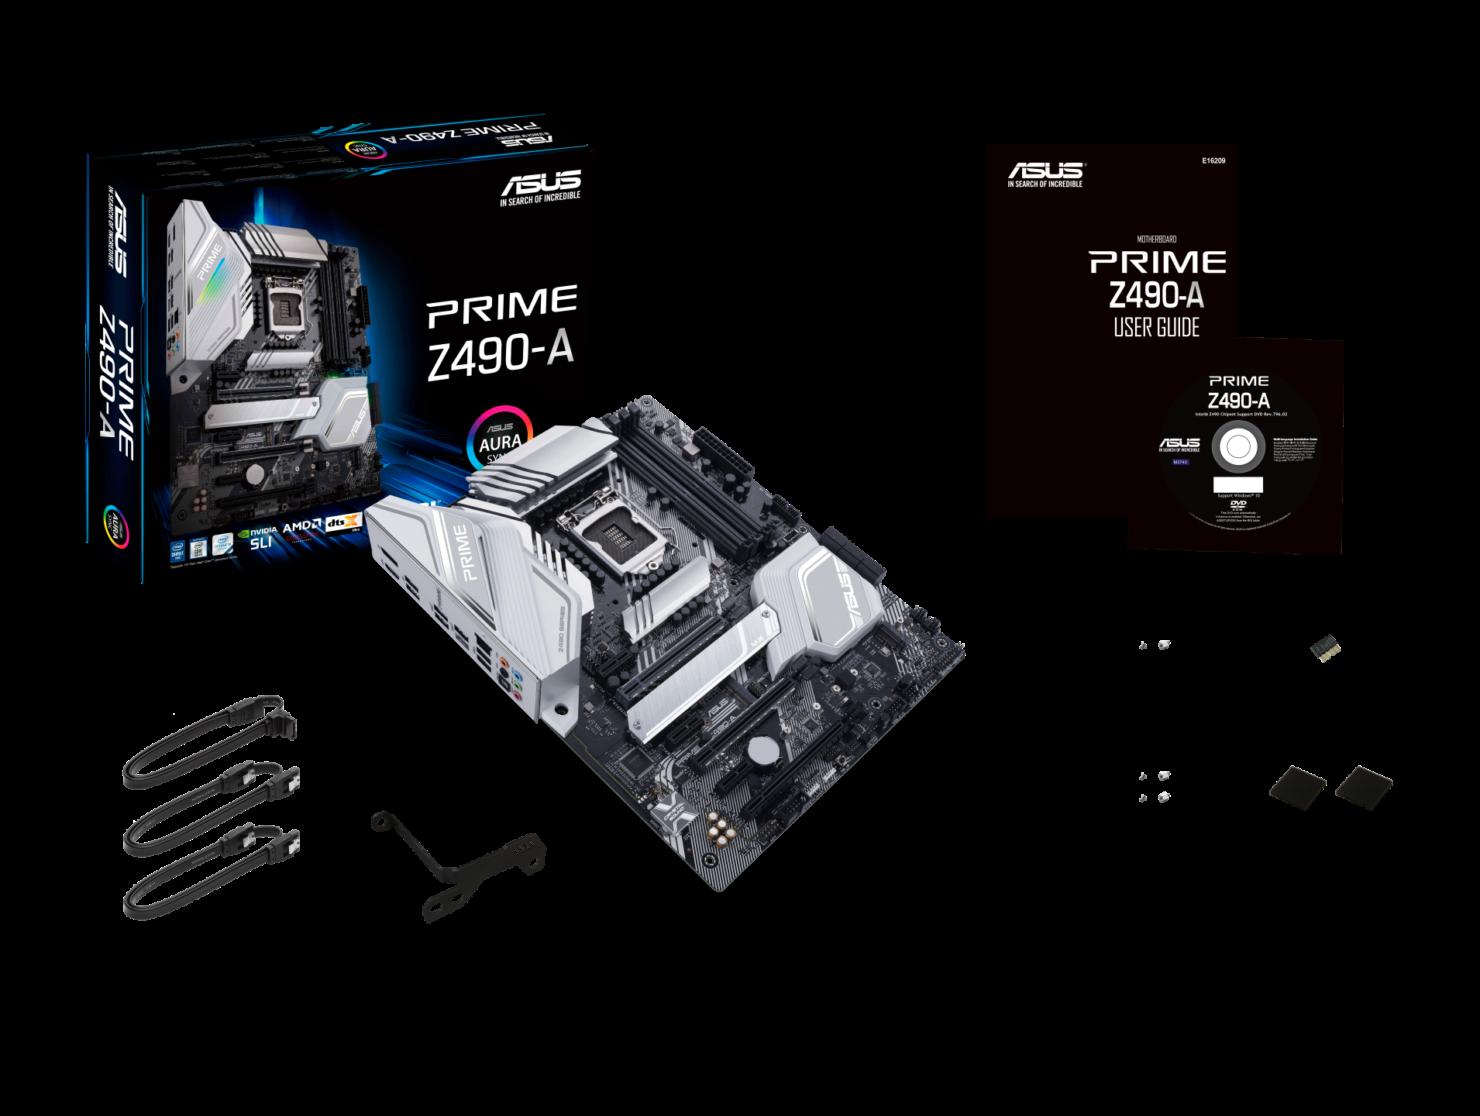 prime-z490-a-whats-inside-the-box-custom